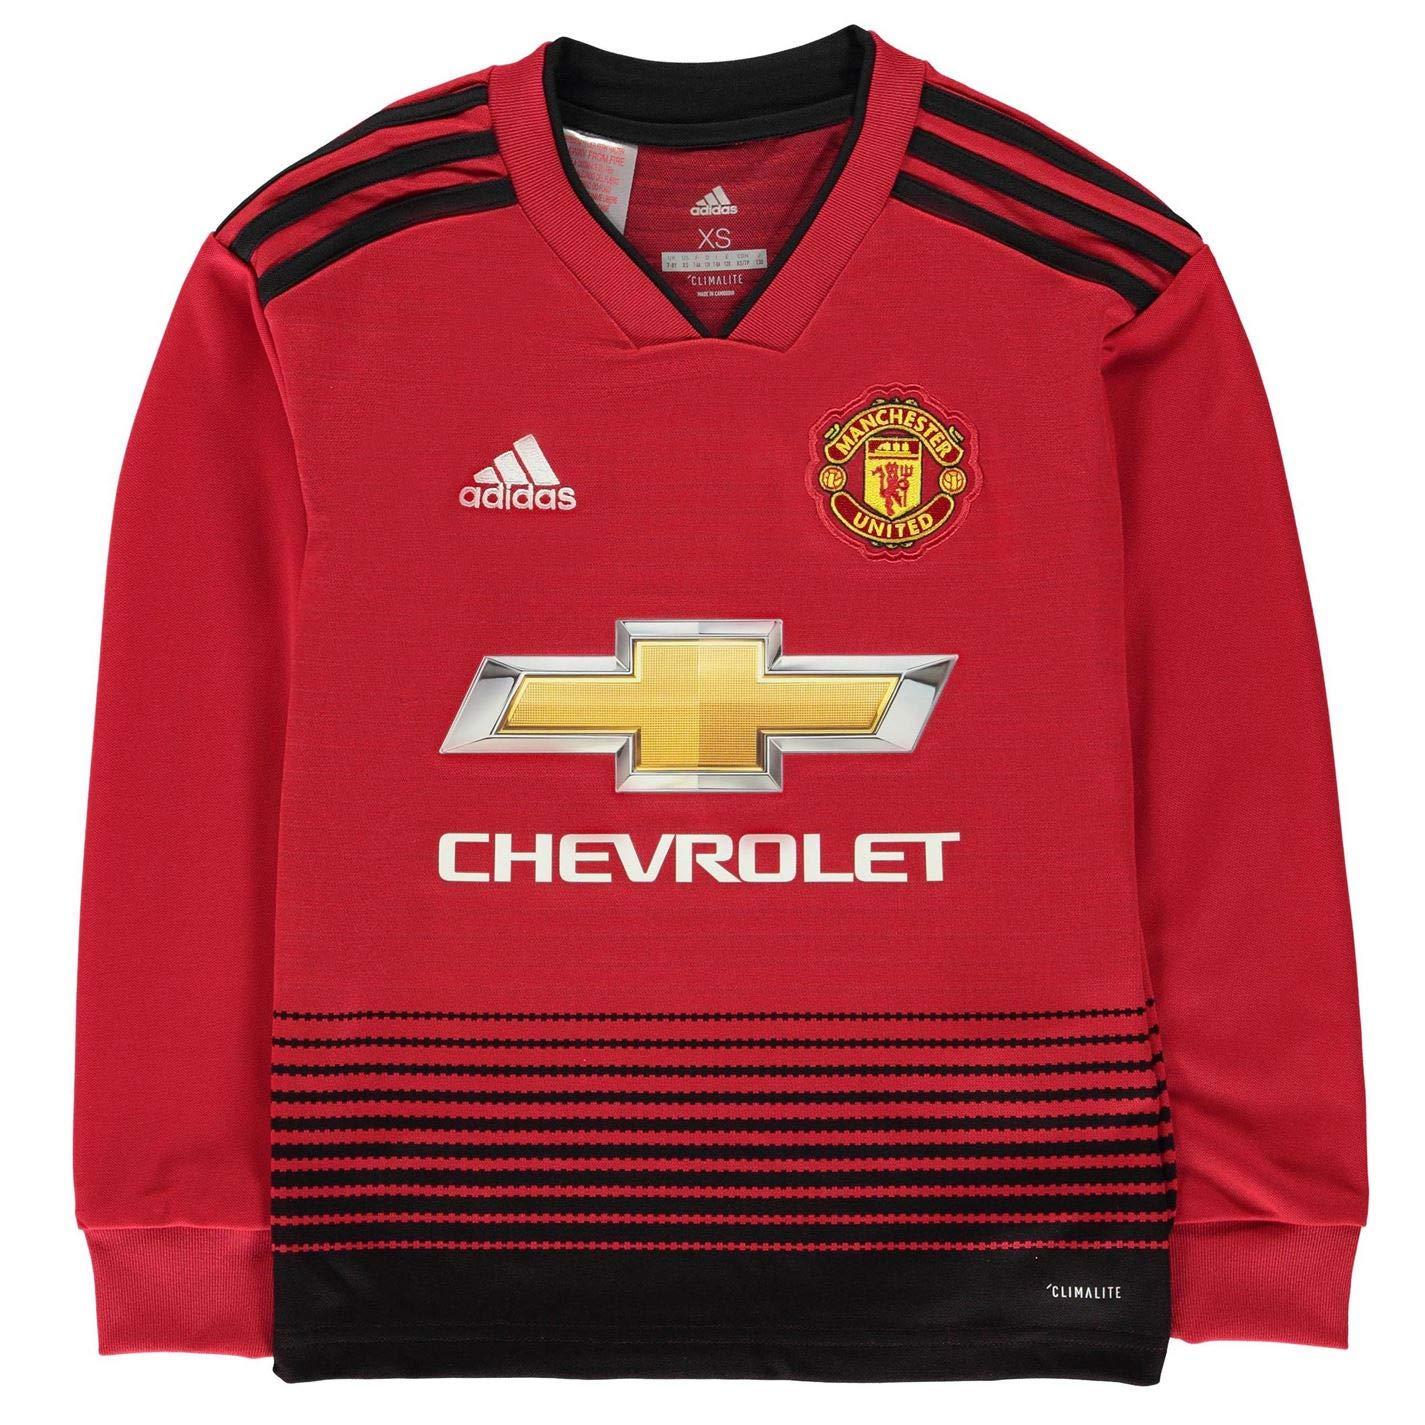 Adidas Kinder 18 19 Manchester United Home Longsleeve Trikot